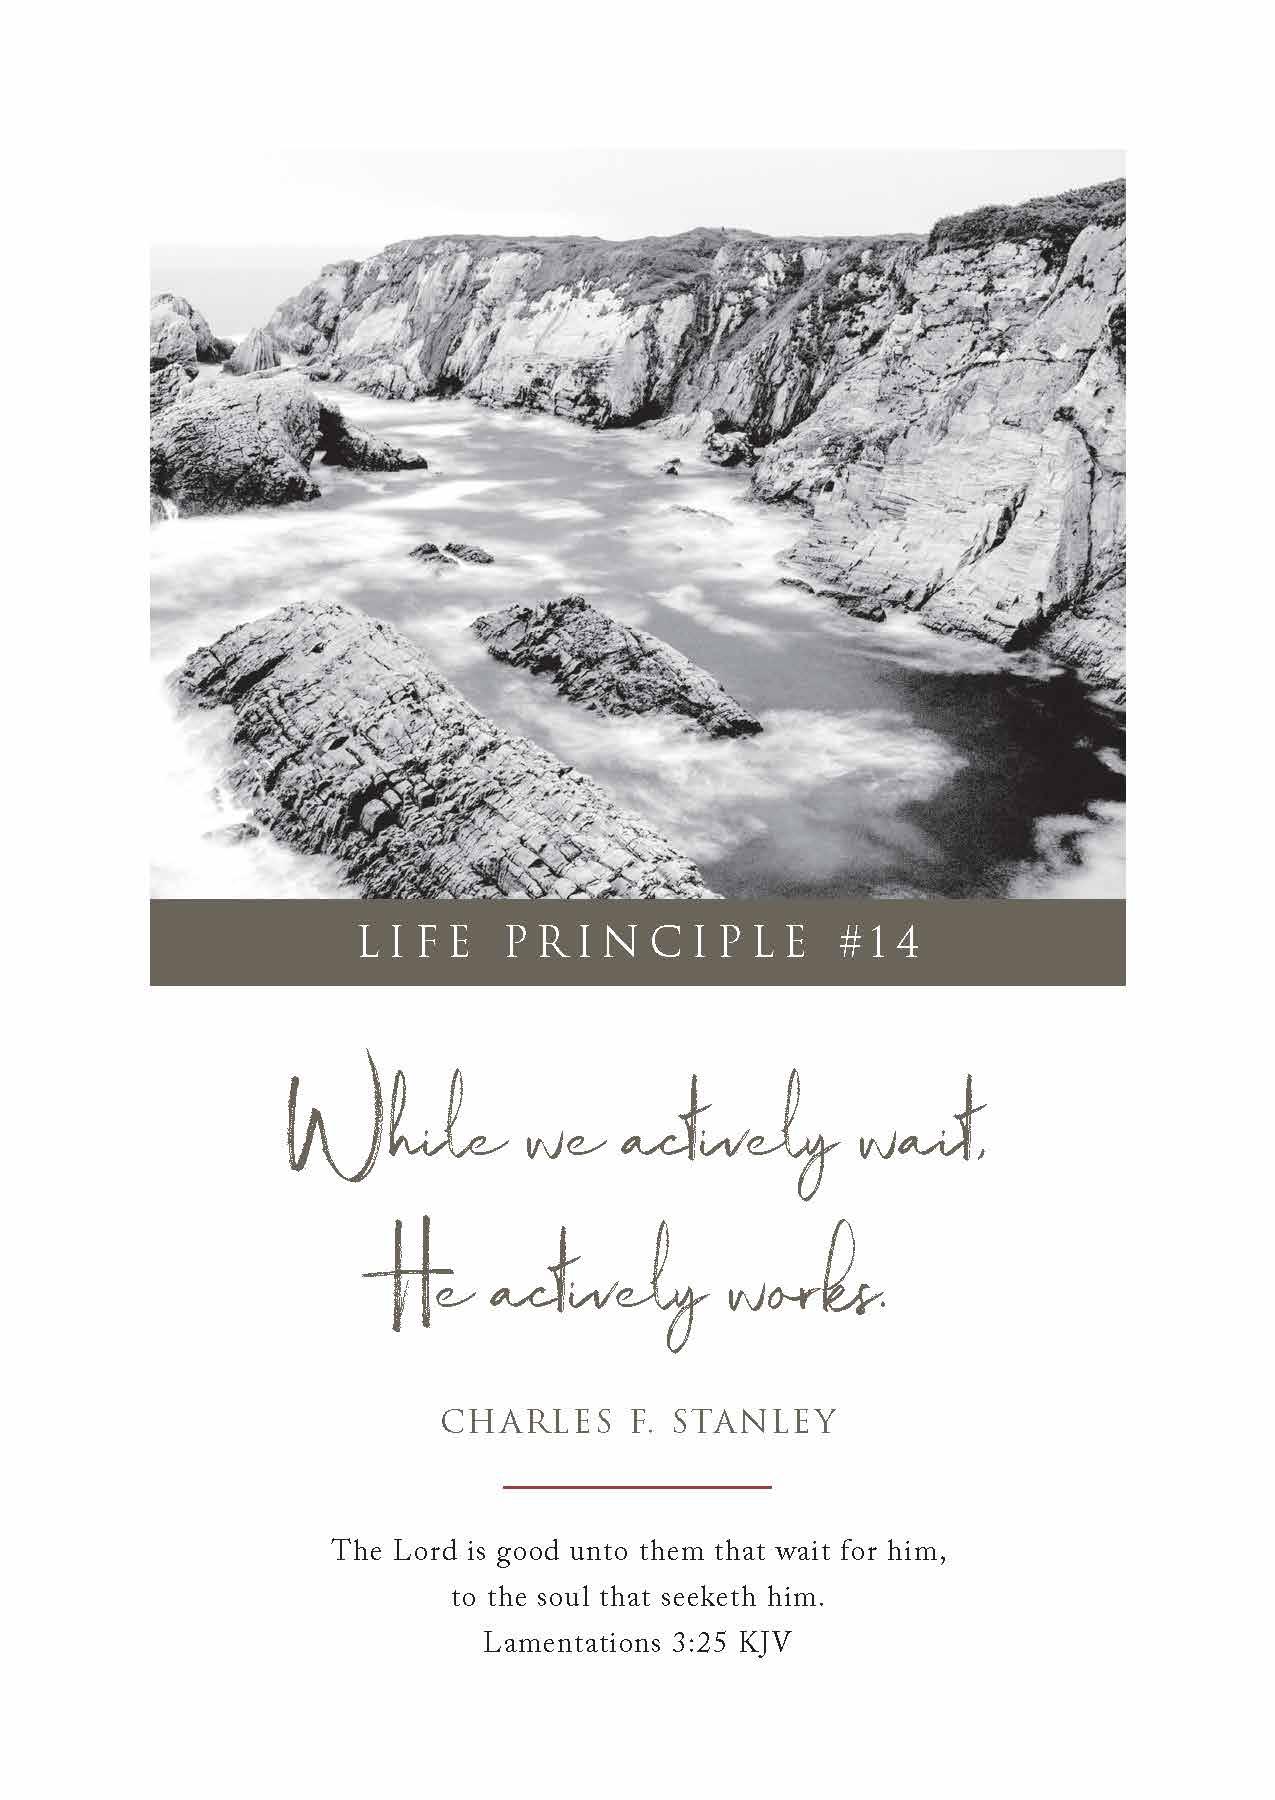 Stanley Scripture card #14